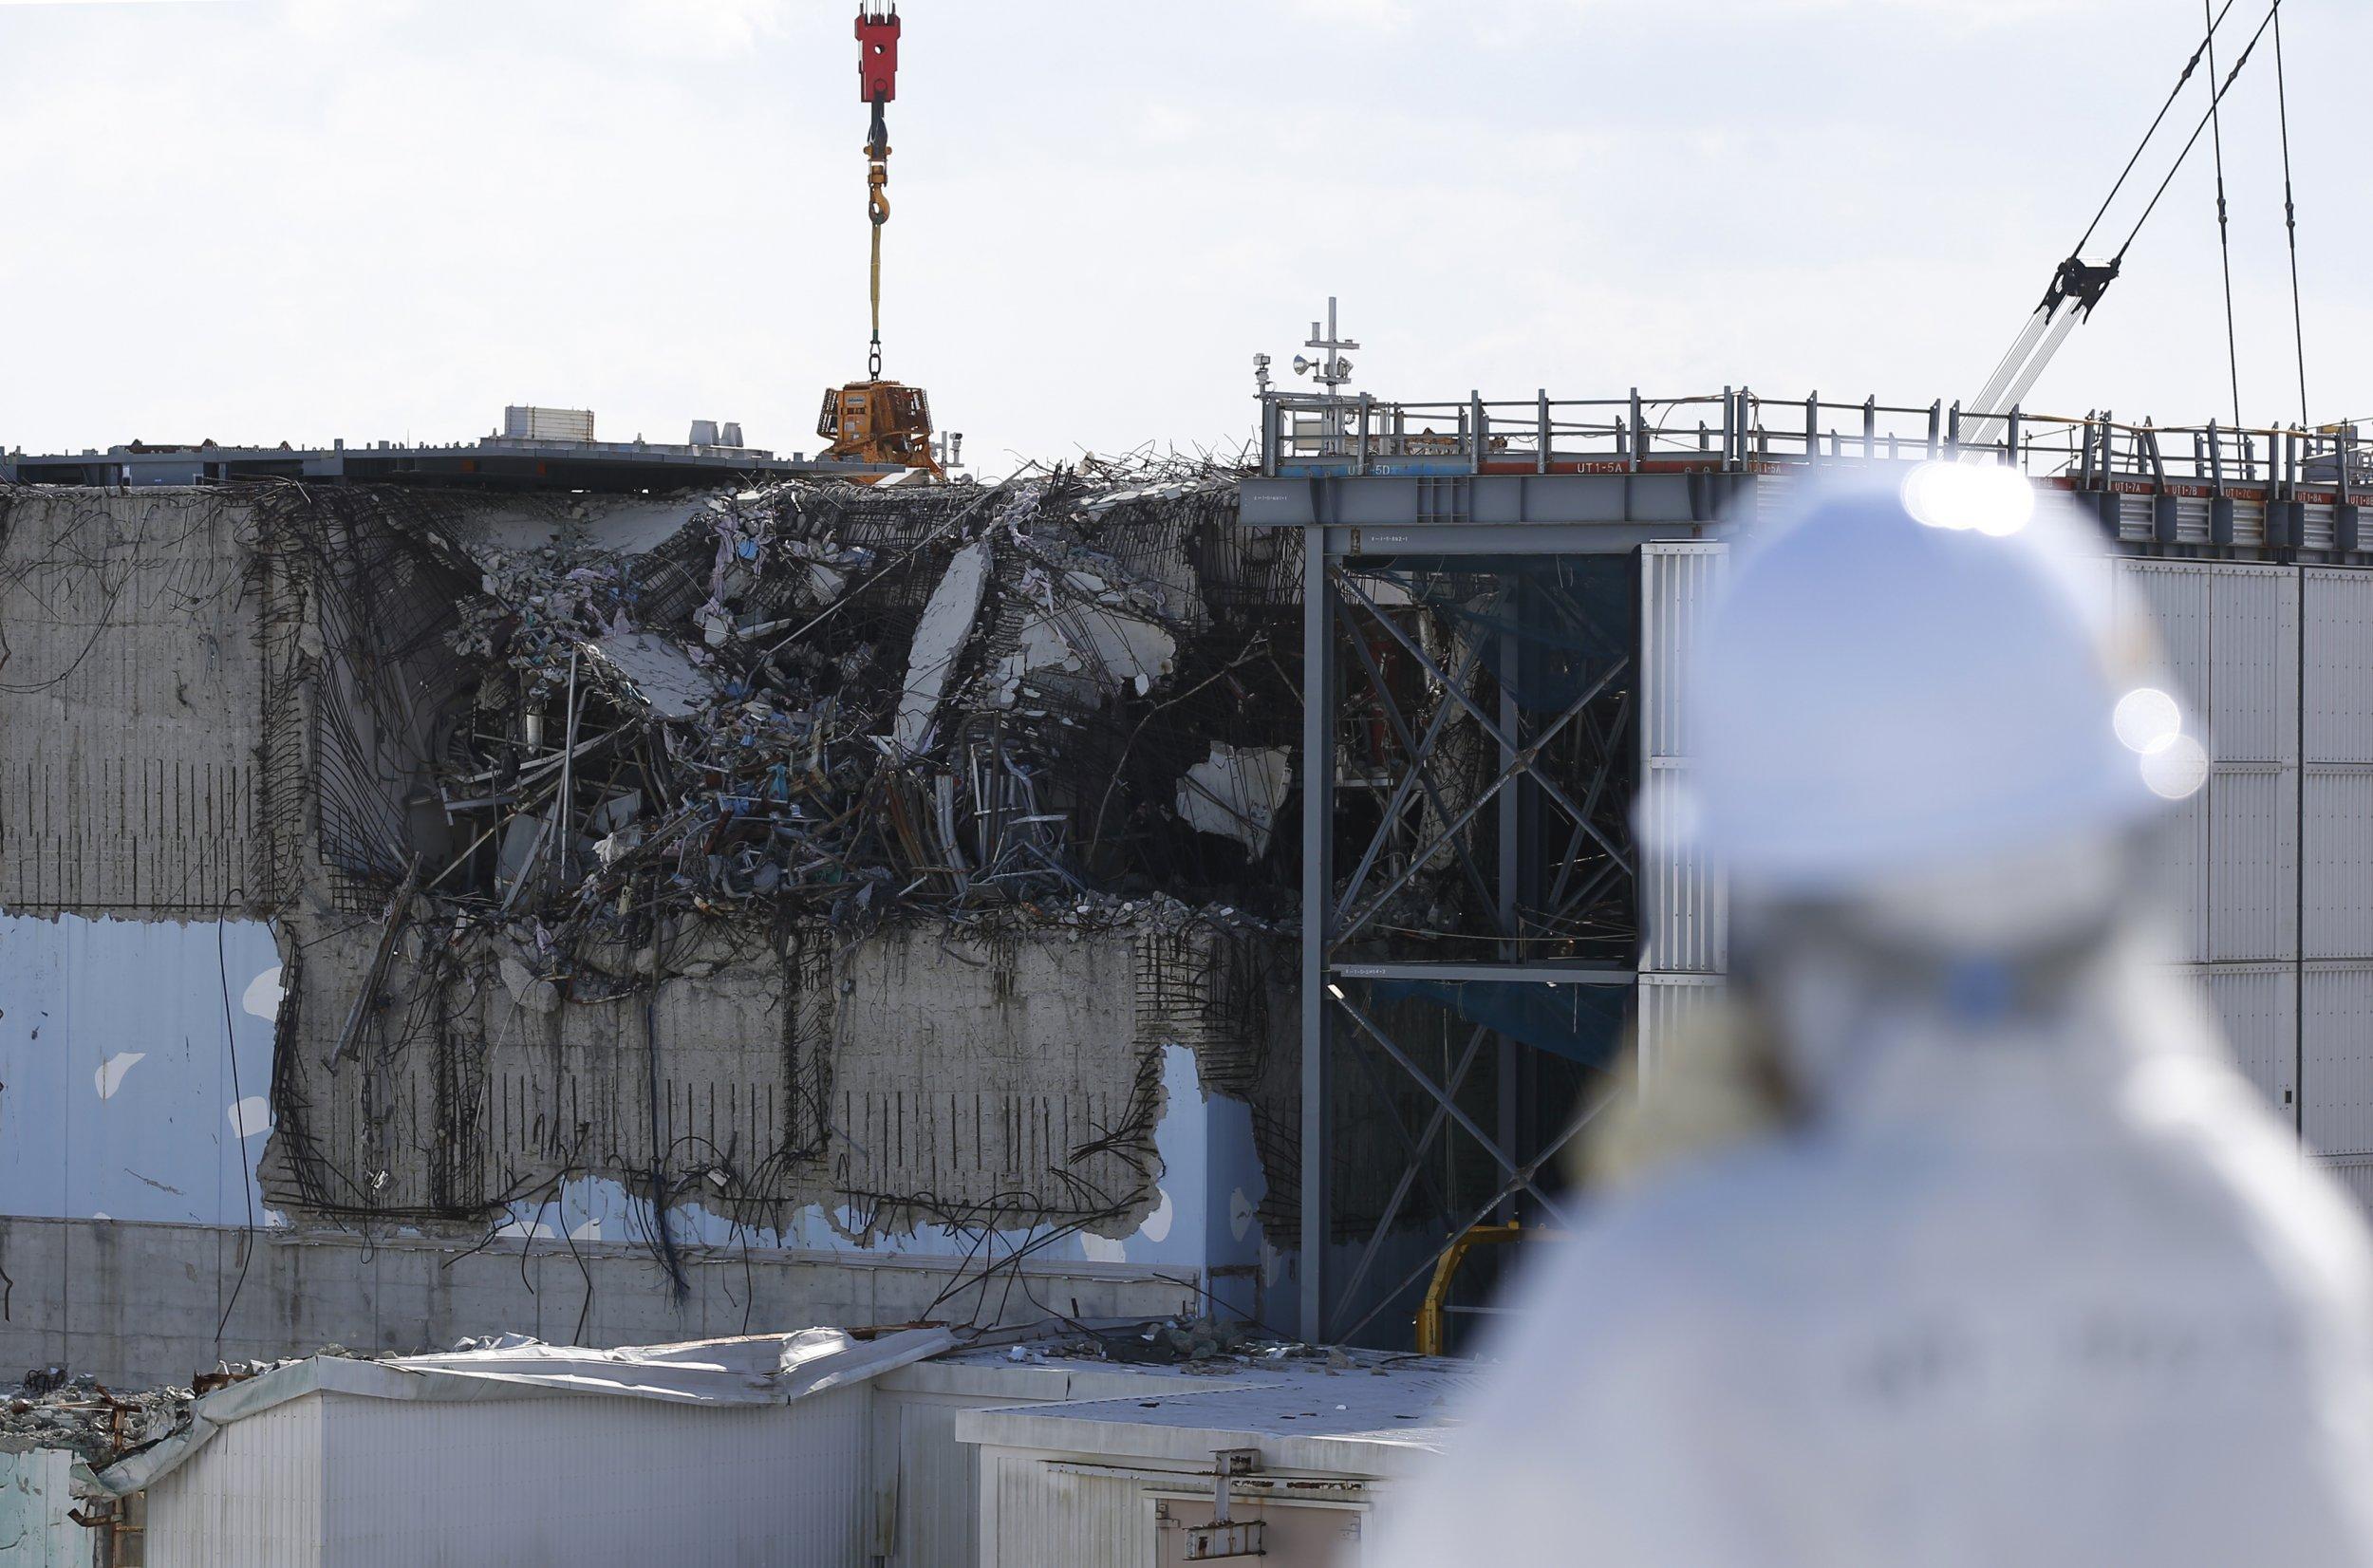 fukushima reactor damage